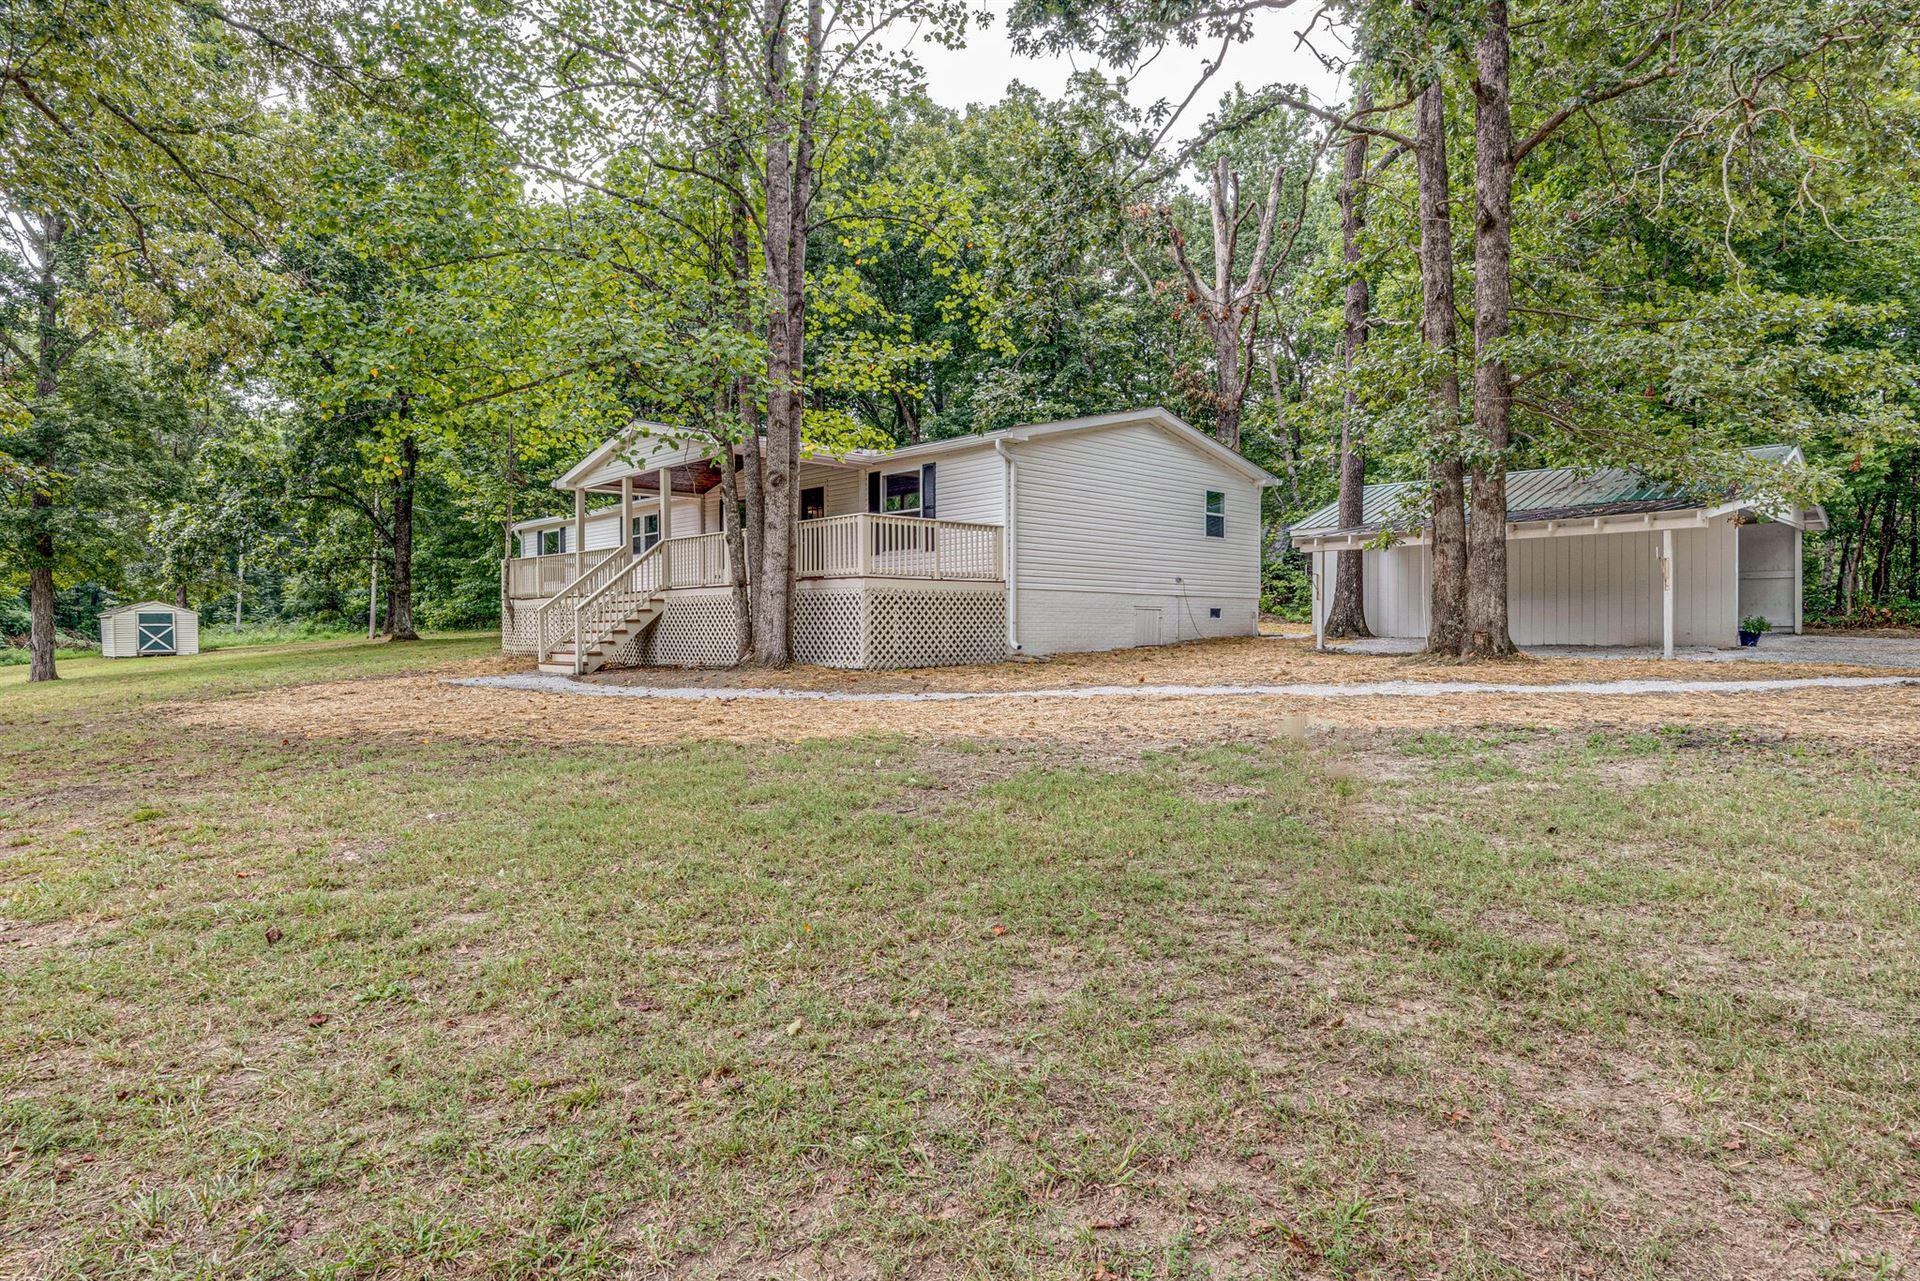 1050 Glendale Rd, White Bluff, TN 37187 - MLS#: 2283285